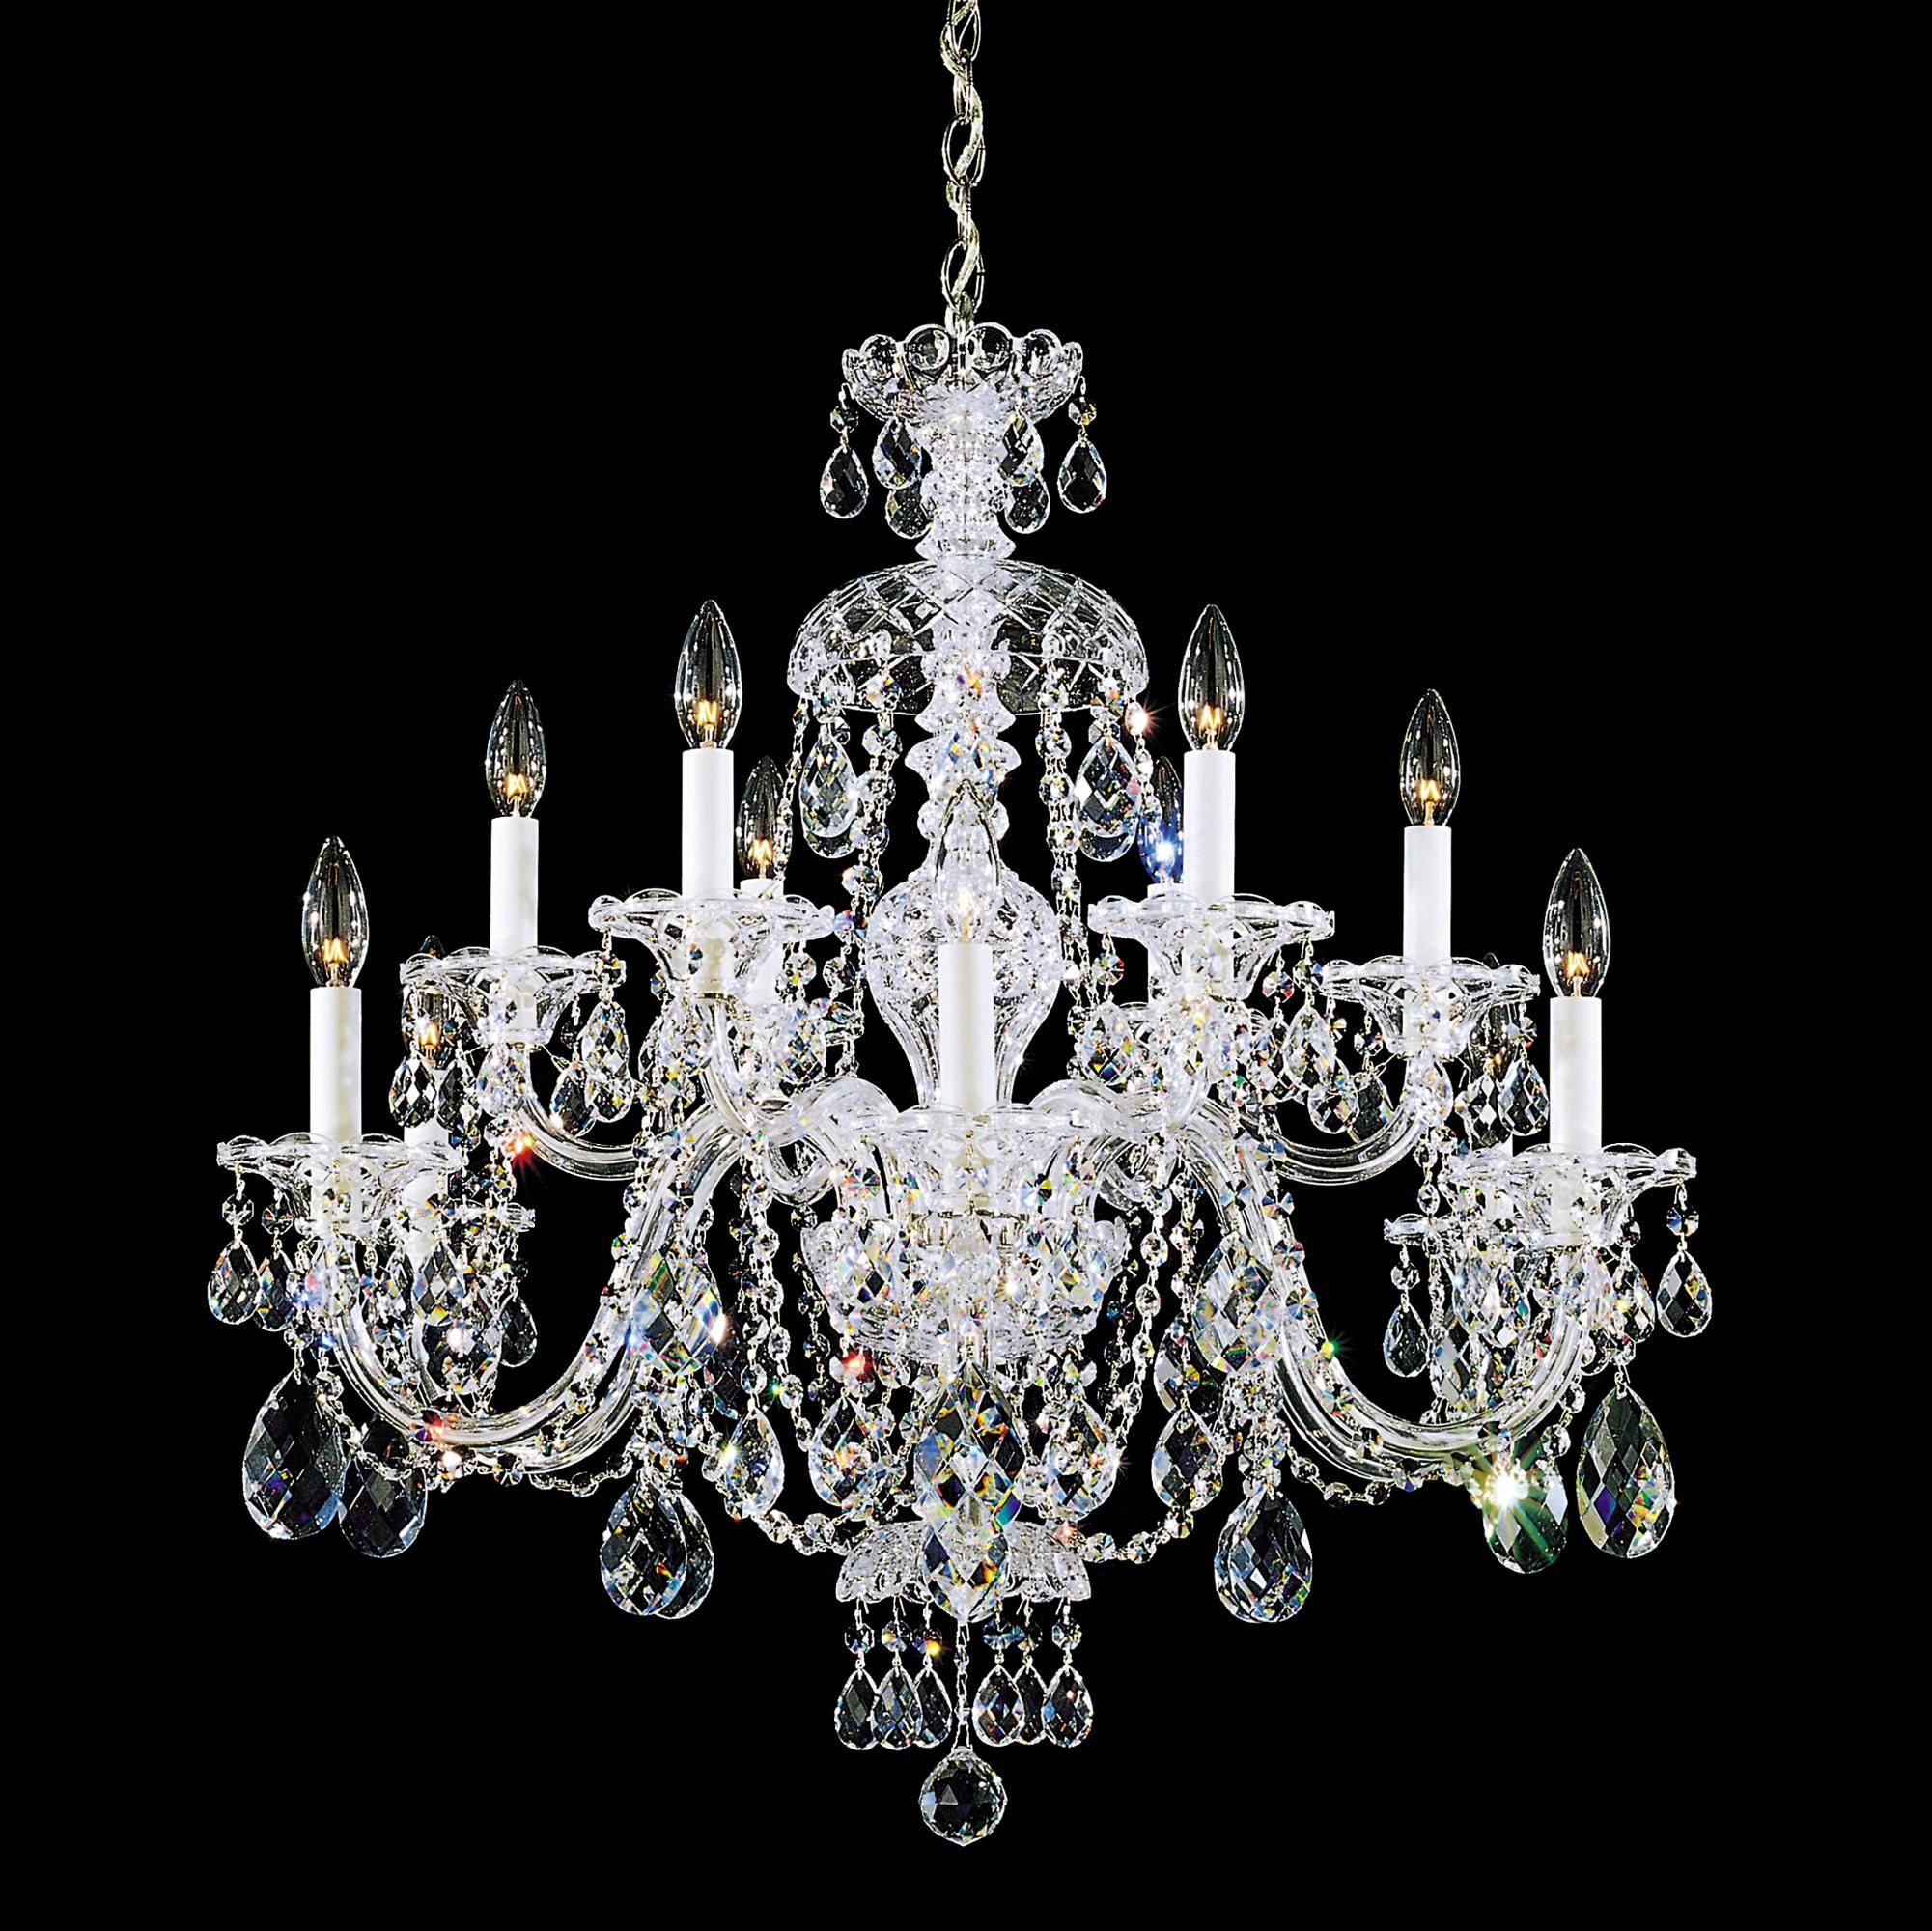 Schonbek sterling 29w swarovski crystal 12 light chandelier schonbek sterling 29w swarovski crystal 12 light chandelier m9982 lamps plus arubaitofo Images